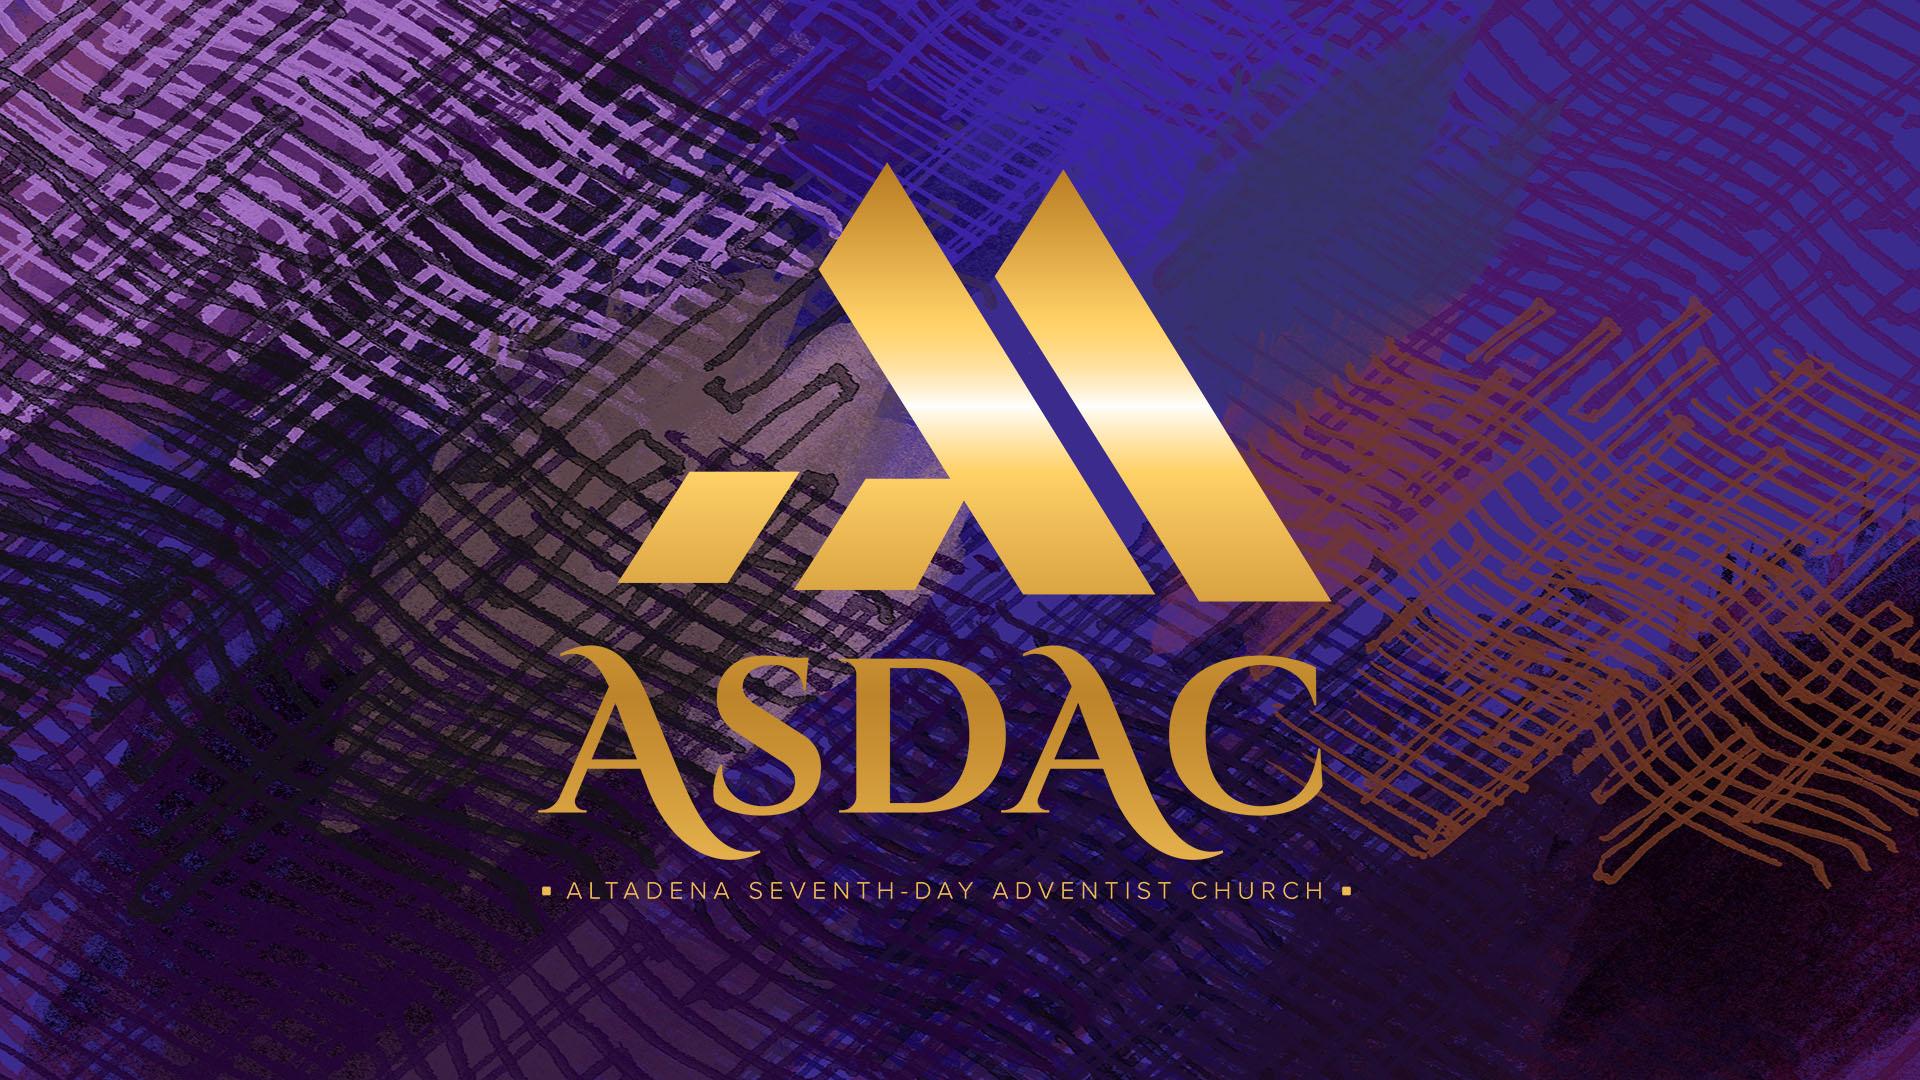 ASDAC-Facebook-Cover-Image_26Oct2019-1